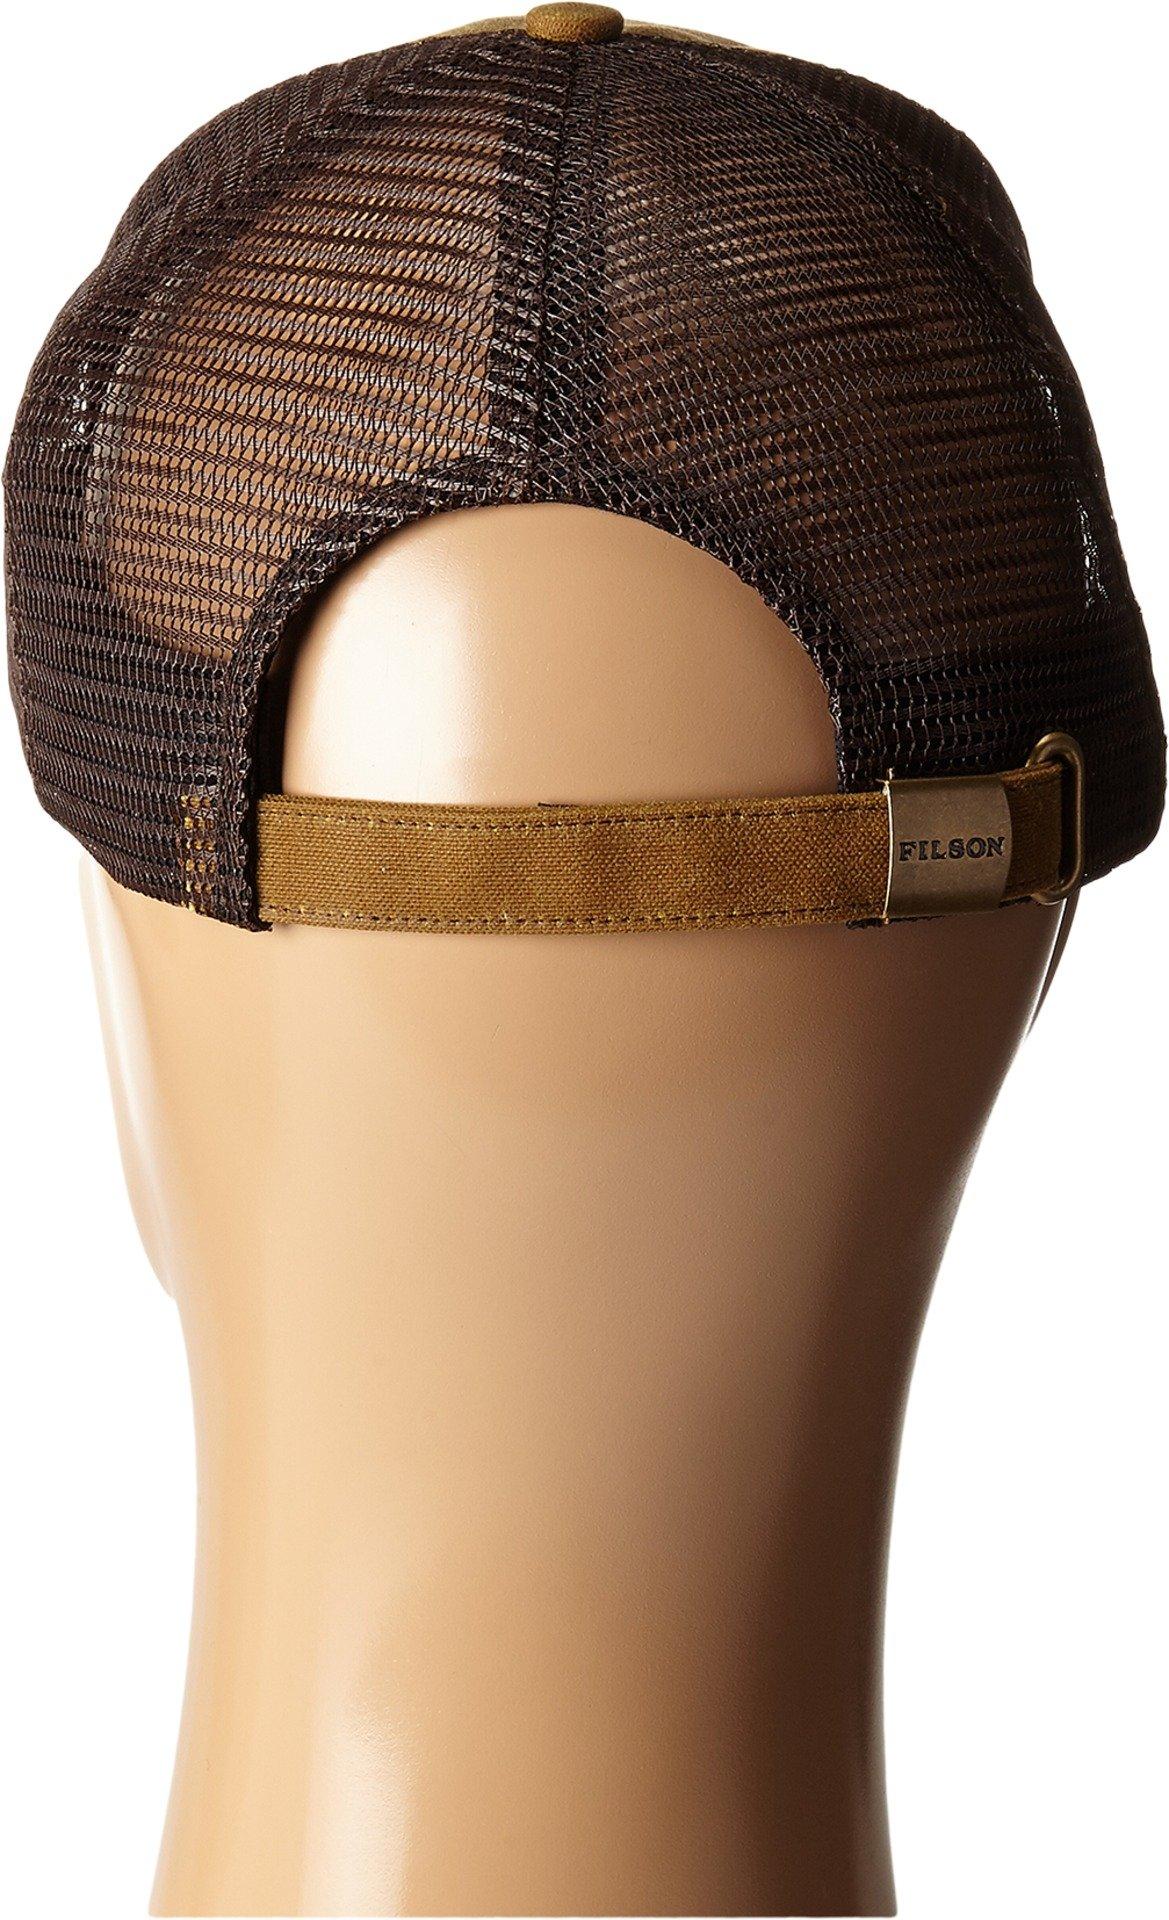 Filson Unisex Logger Mesh Cap Dark Tan Hat by Filson (Image #3)